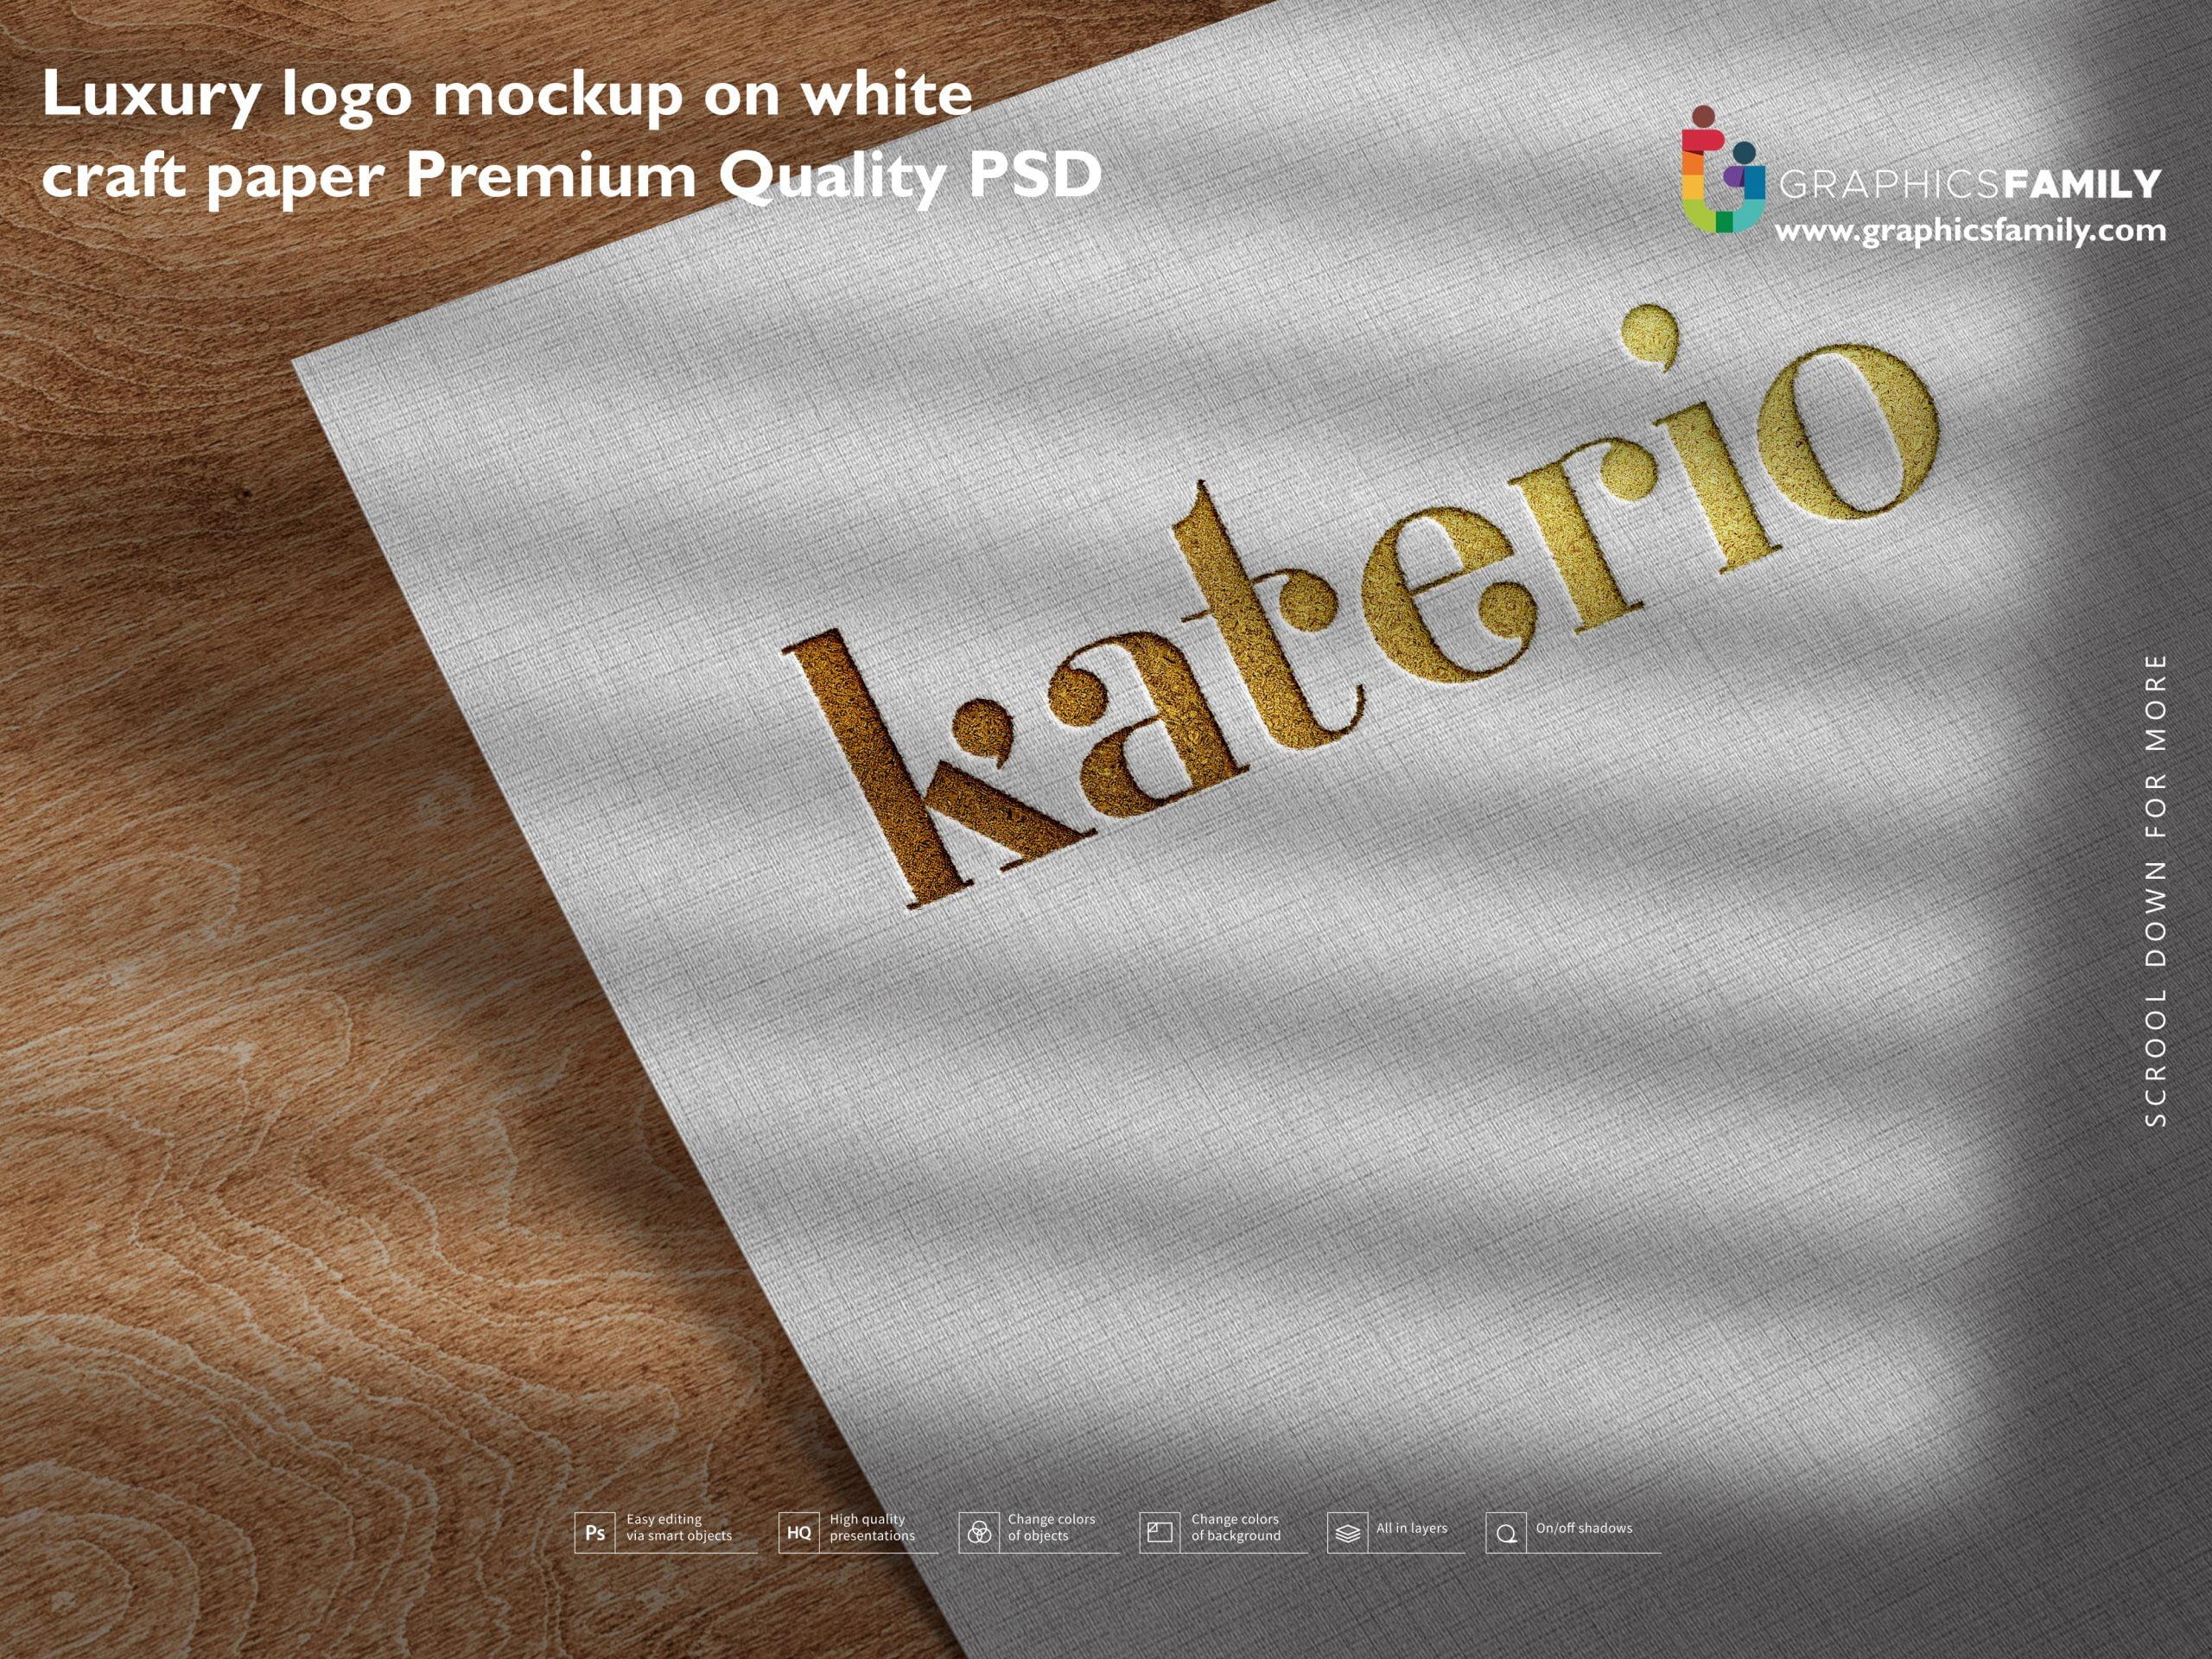 Free Luxury logo mockup on white craft paper Premium Quality Psd Download